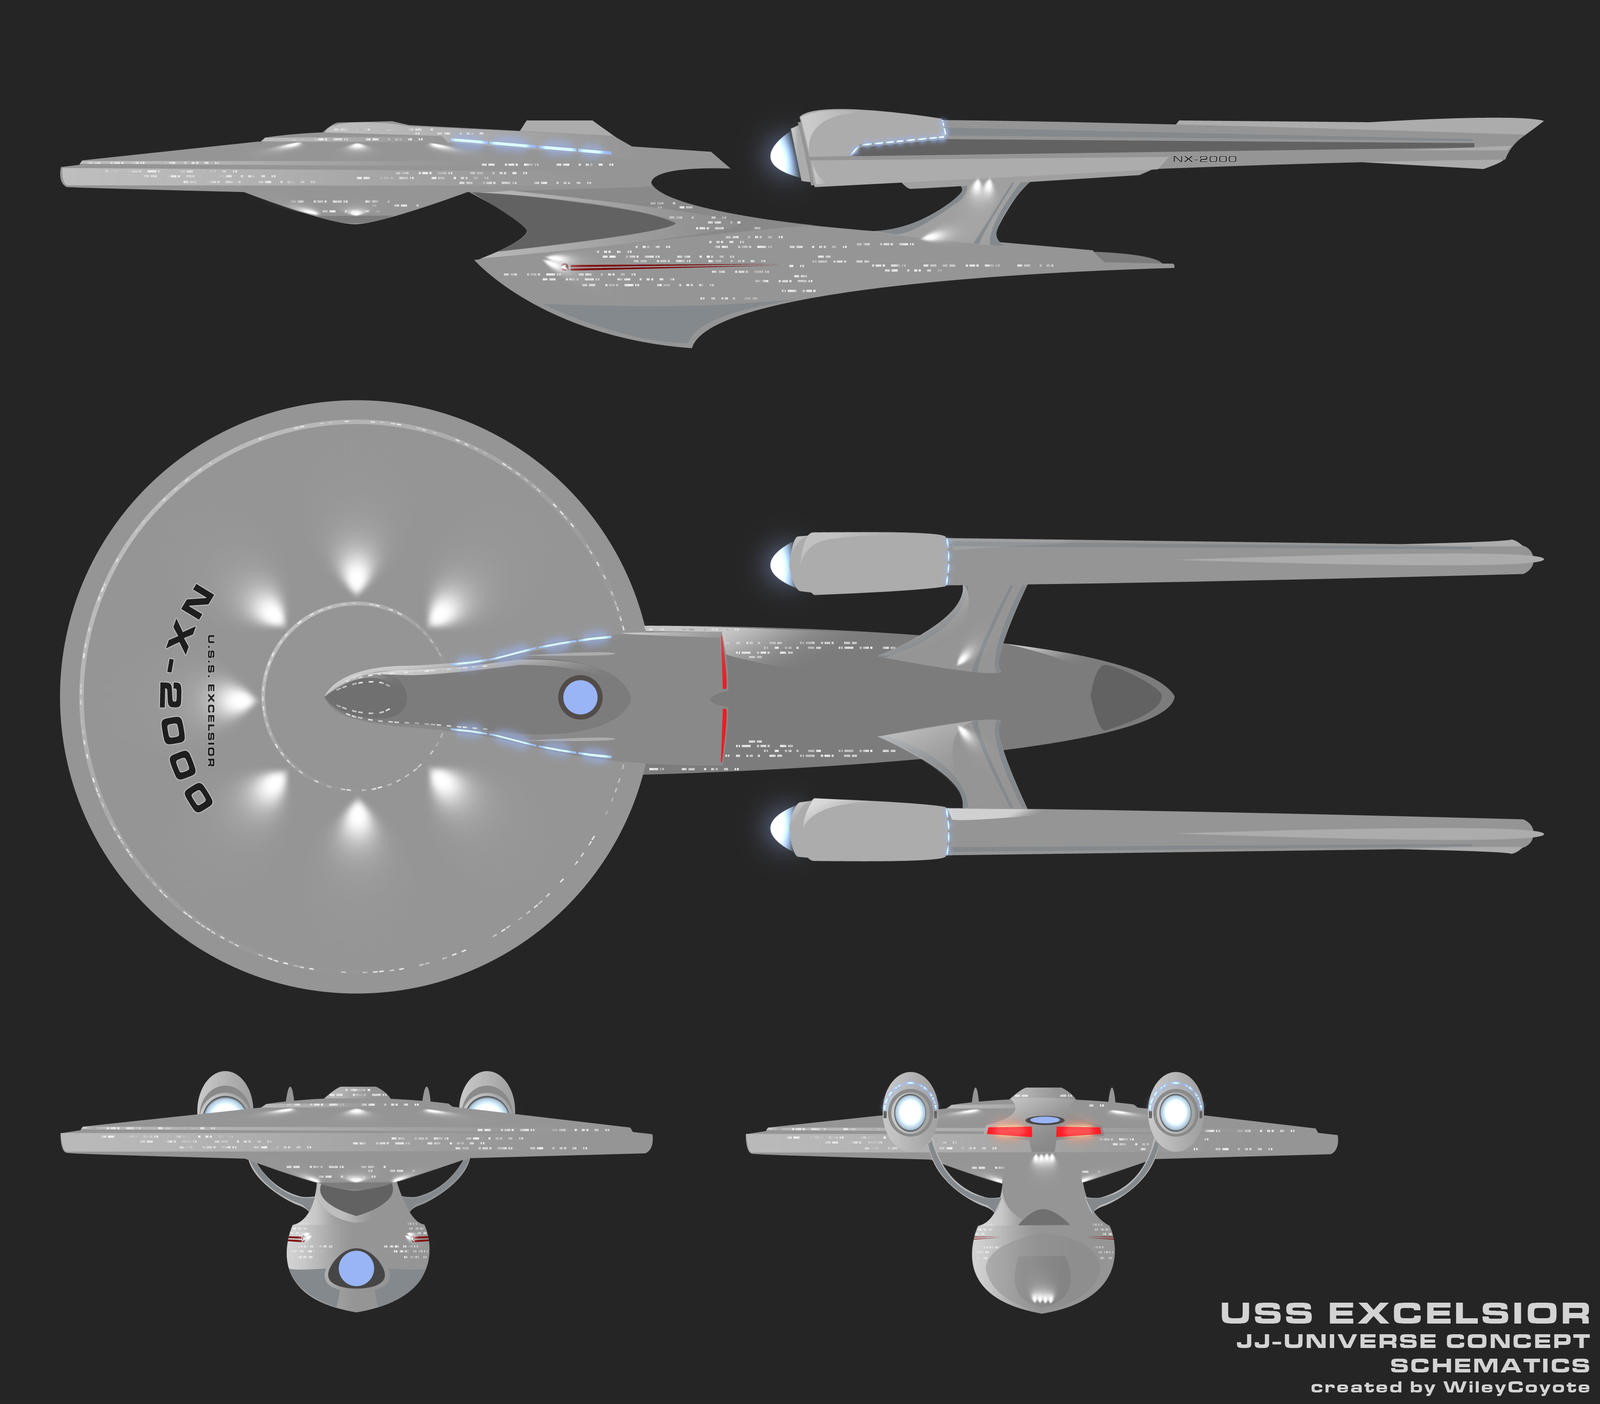 JJ-Excelsior schematics by trekmodeler on DeviantArt